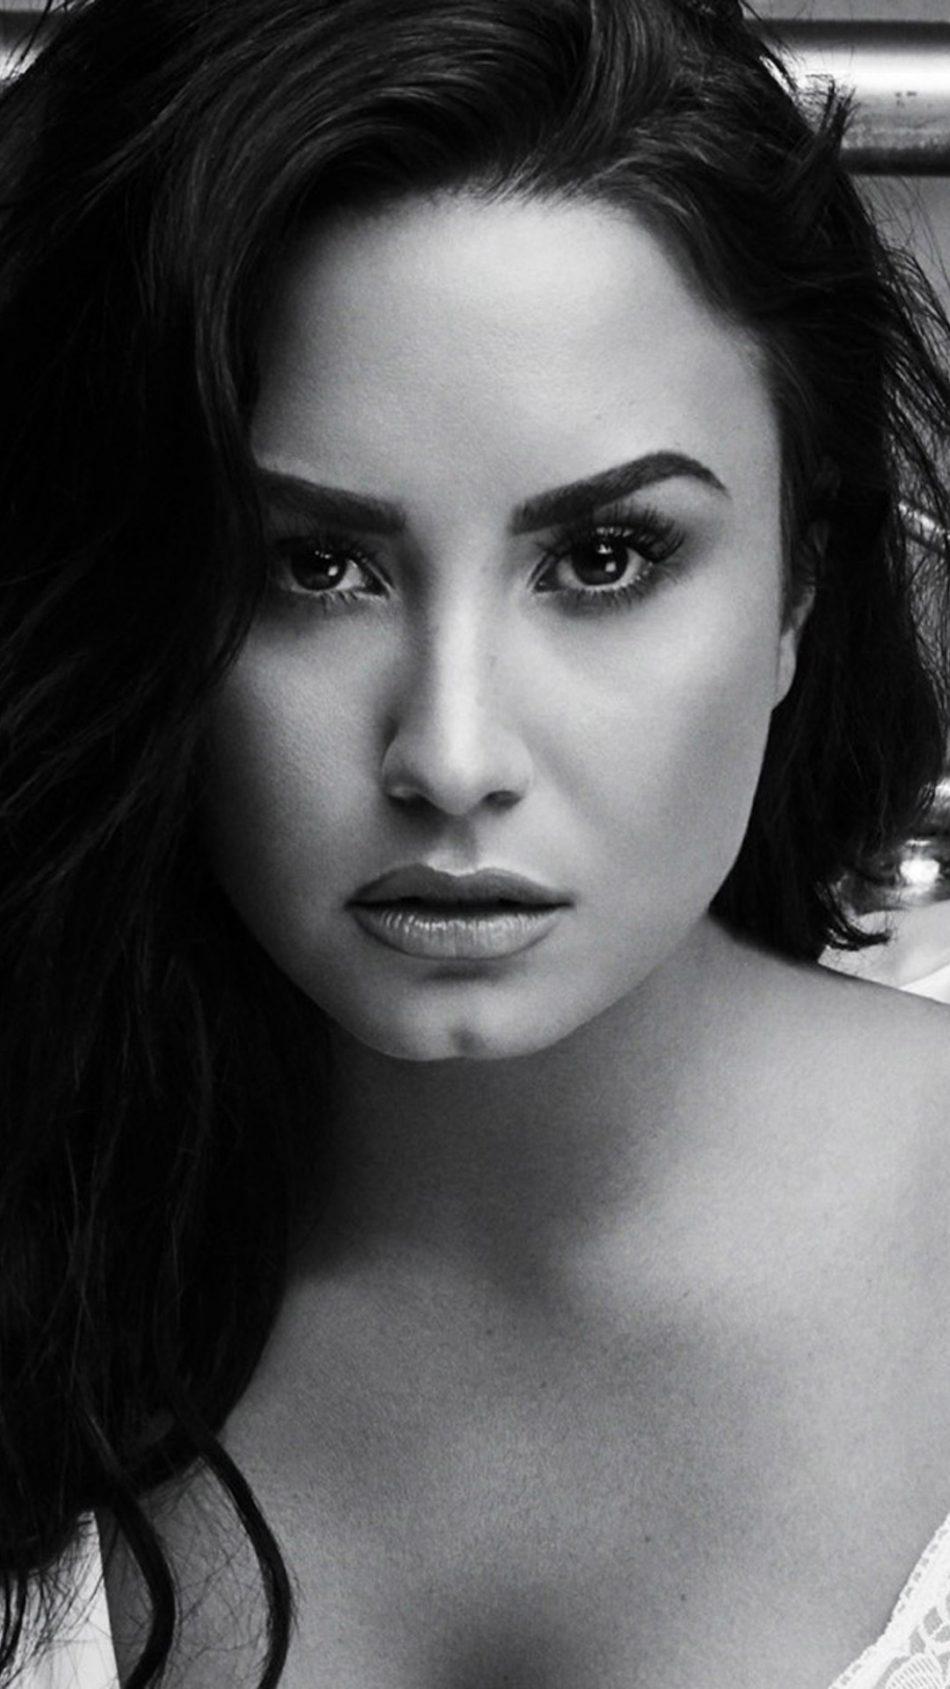 Demi Lovato Hot Black & White Photoshoot HD Mobile Wallpaper